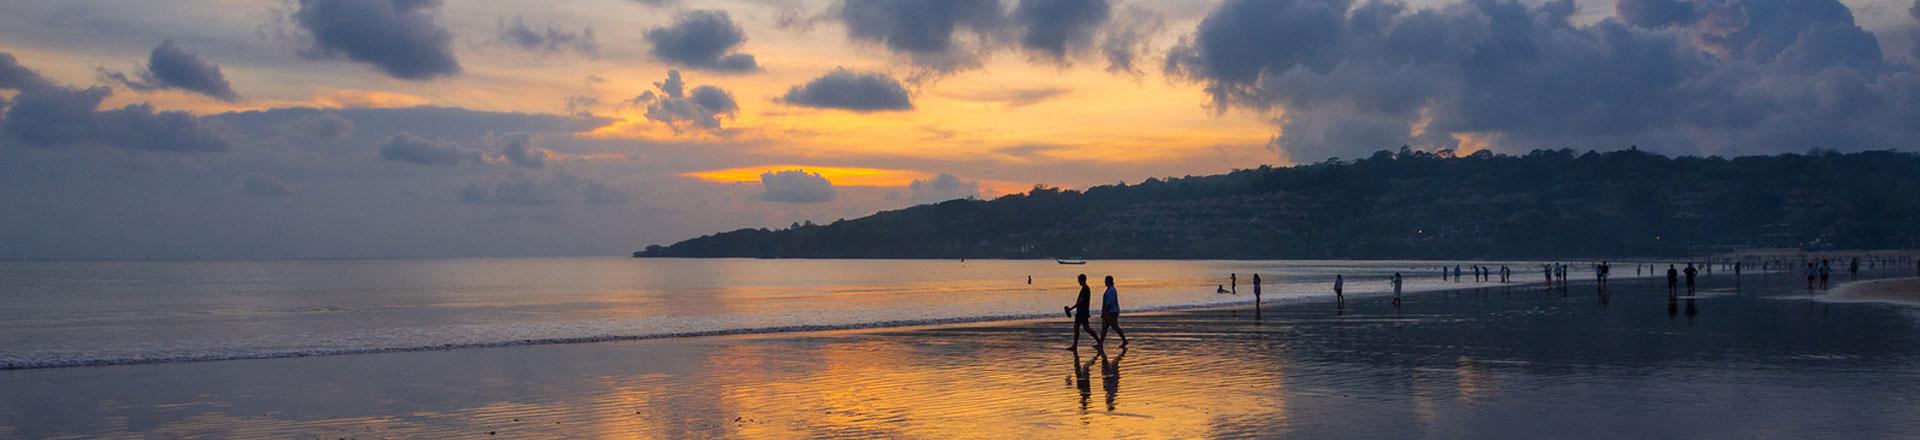 walk-on-beach